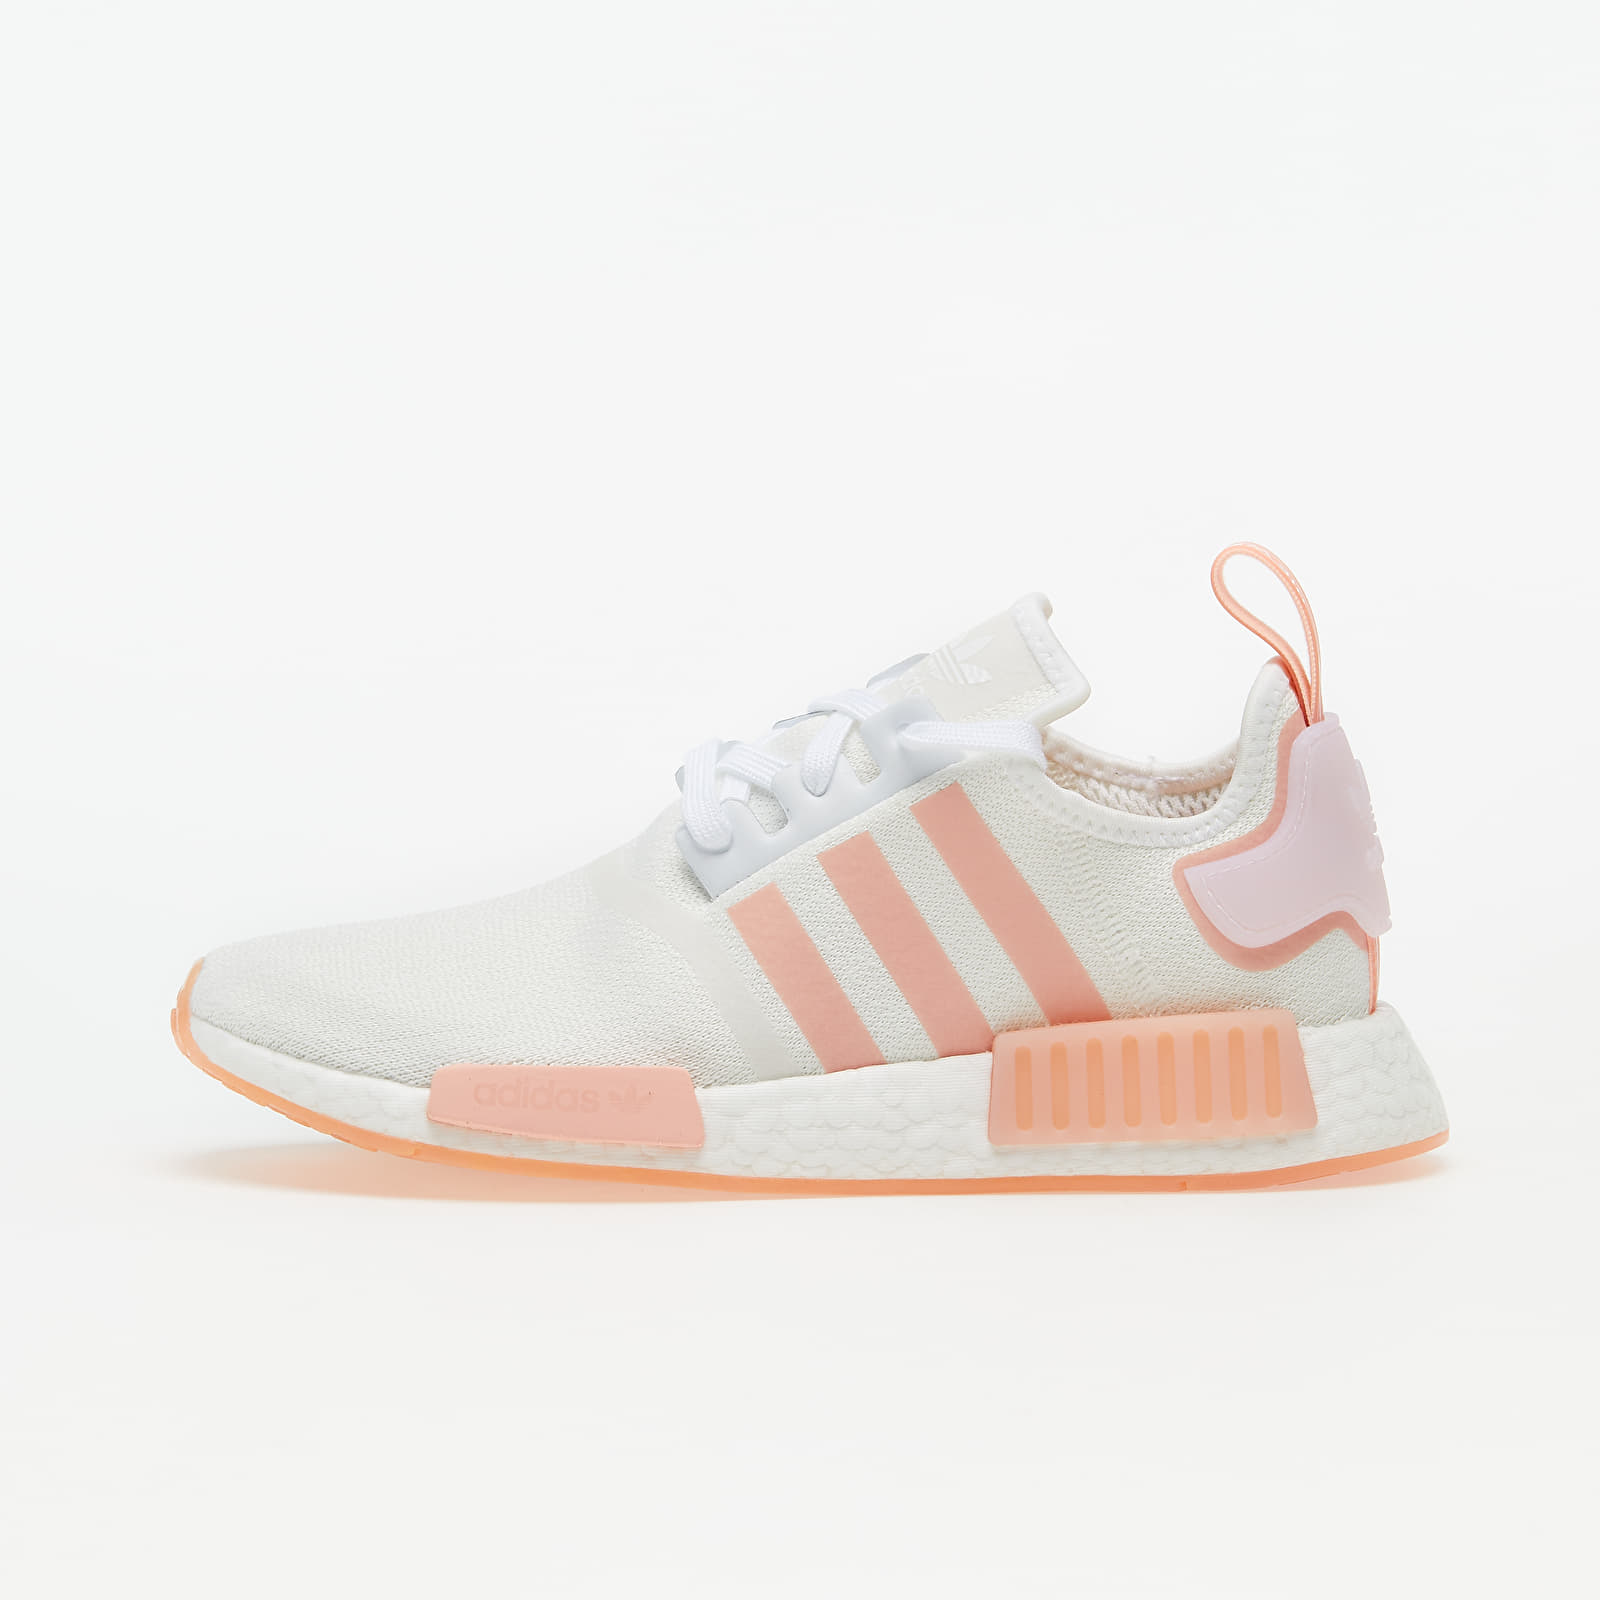 adidas NMD_R1 W Ftwr White/ Ftwr White/ Haze Coral EUR 40 2/3